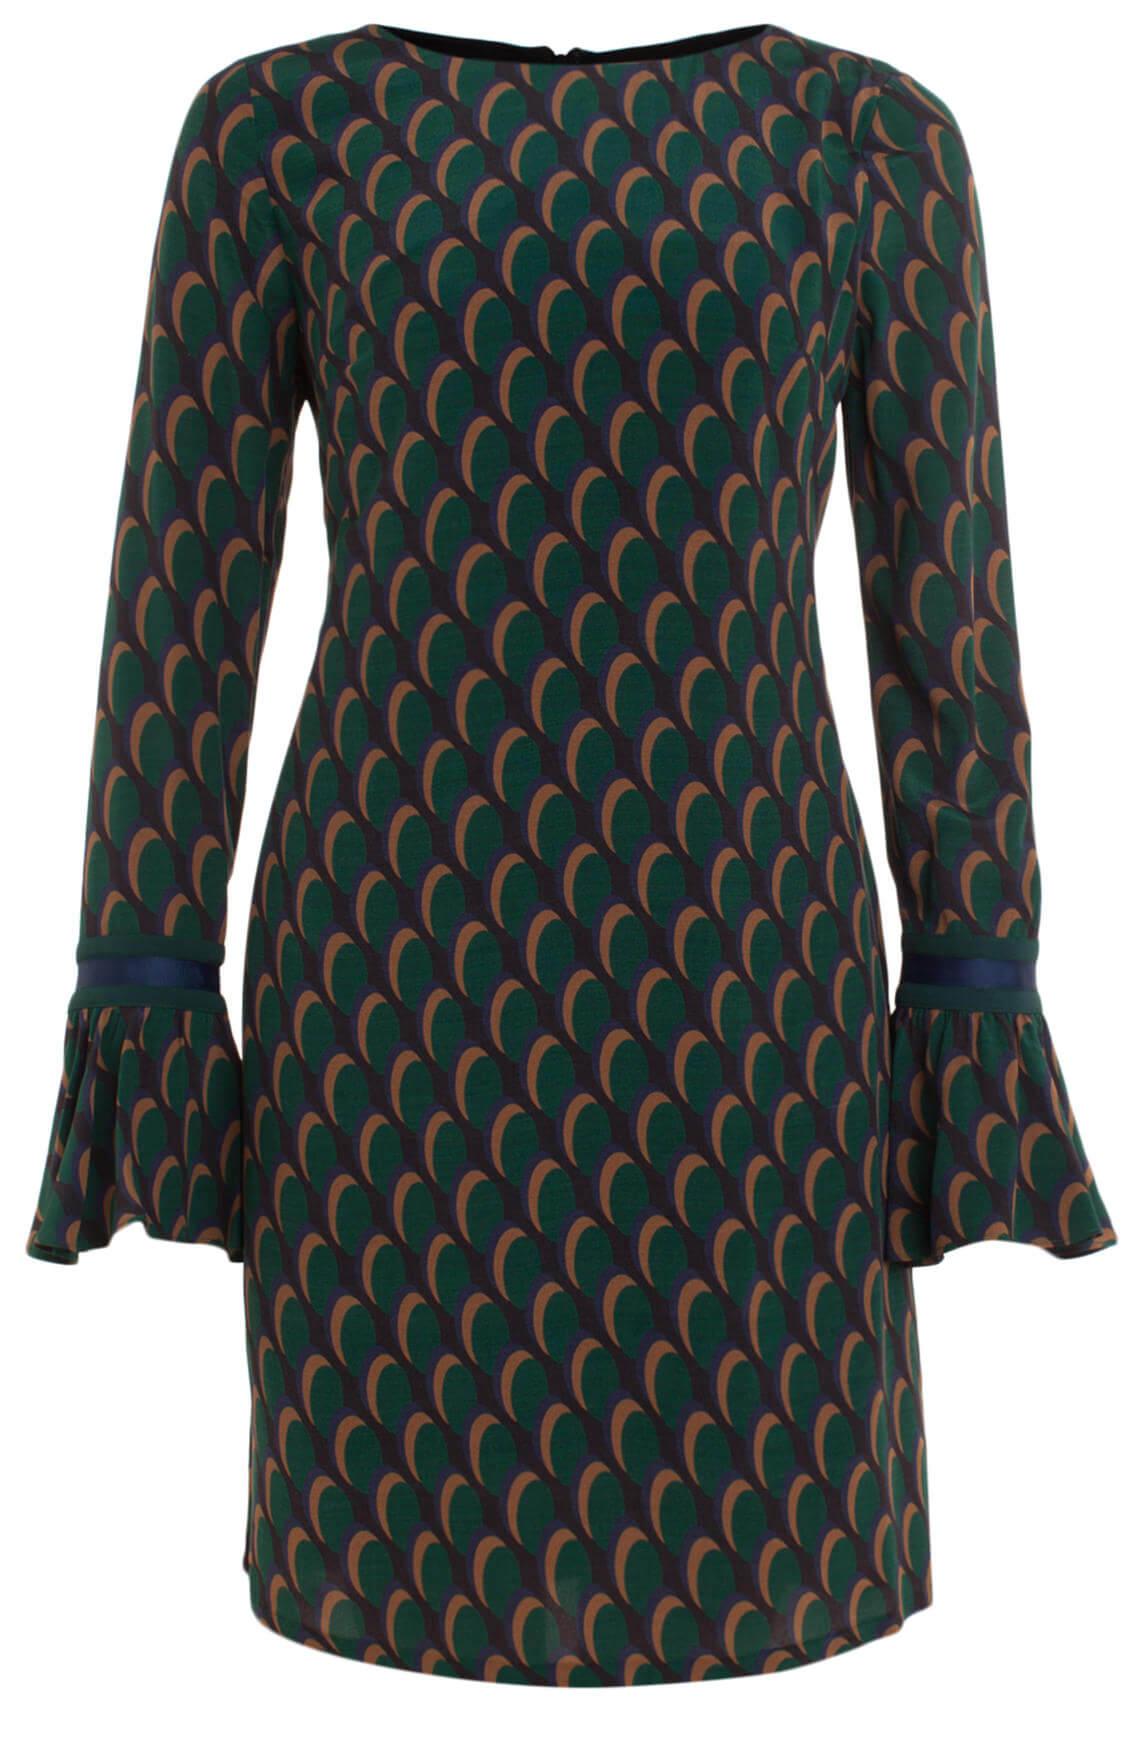 Kocca Dames Yoshik jurk met volantmouwen groen